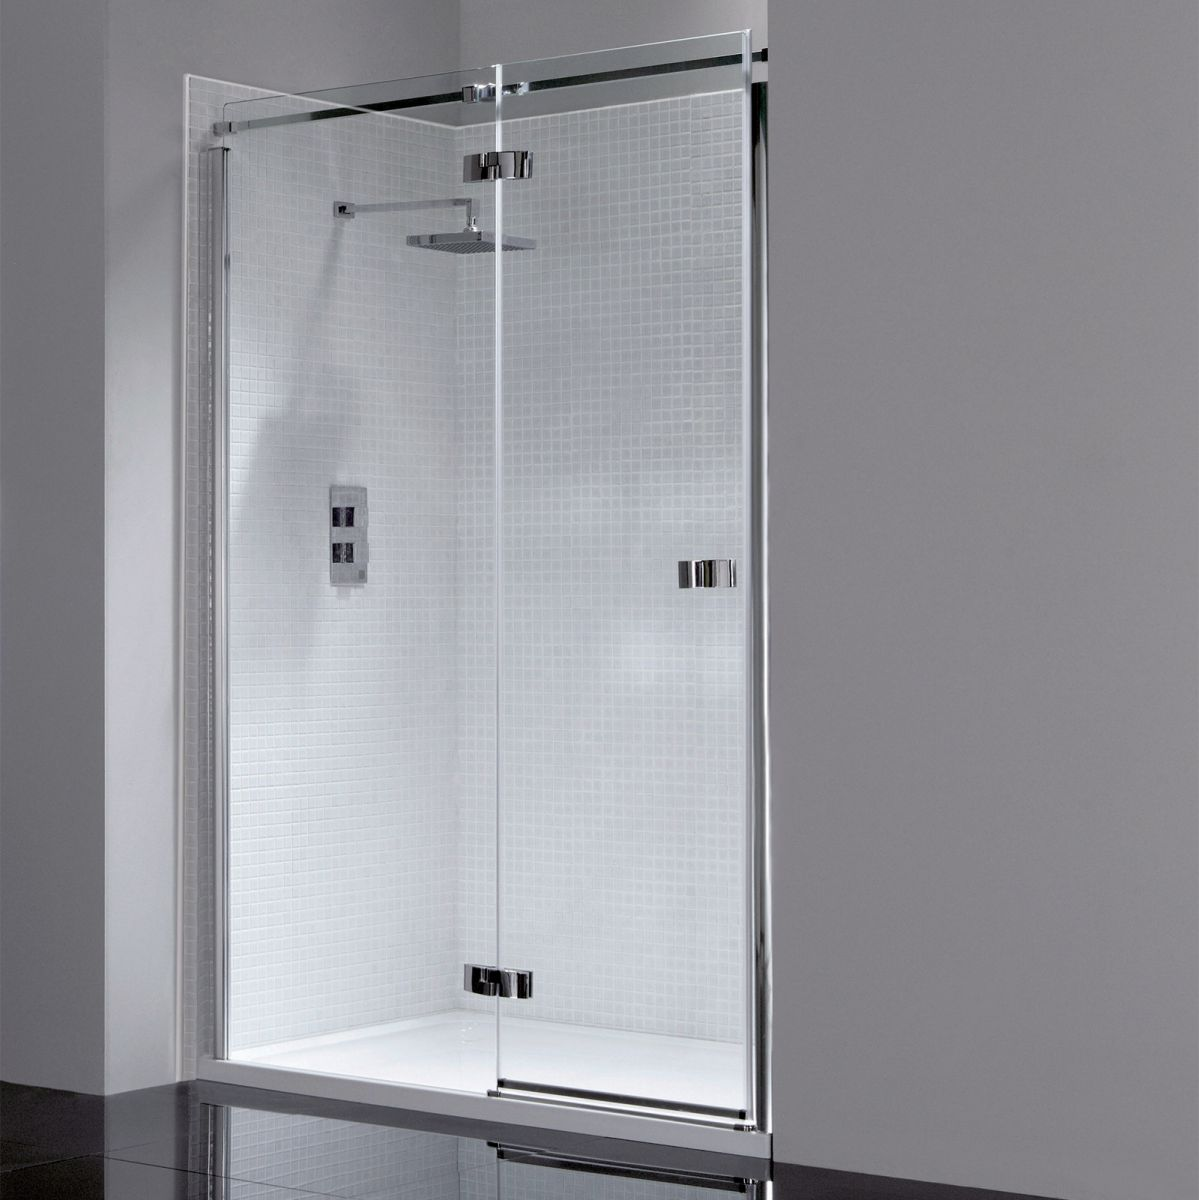 April Prestige Frameless Hinged Shower Door